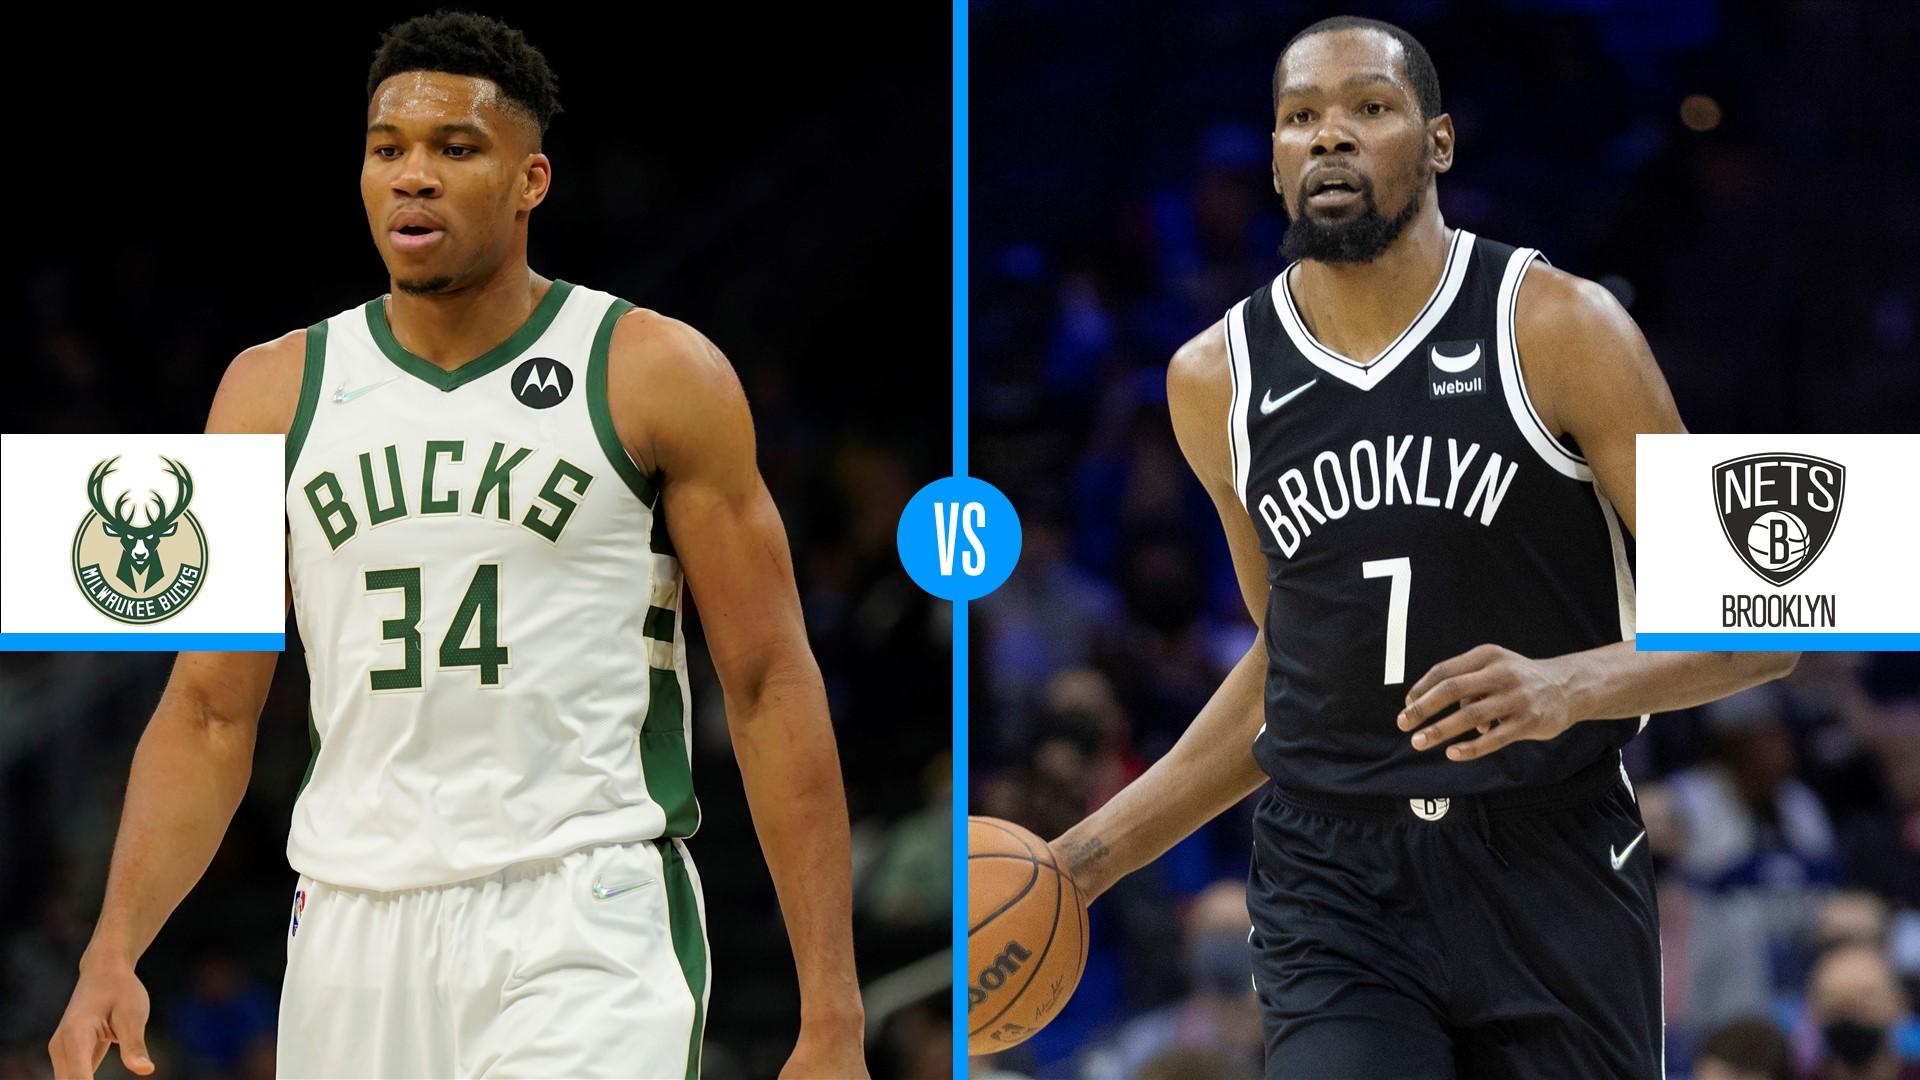 Nets vs. Bucks live score, updates, highlights from 2021 NBA Opening Night game